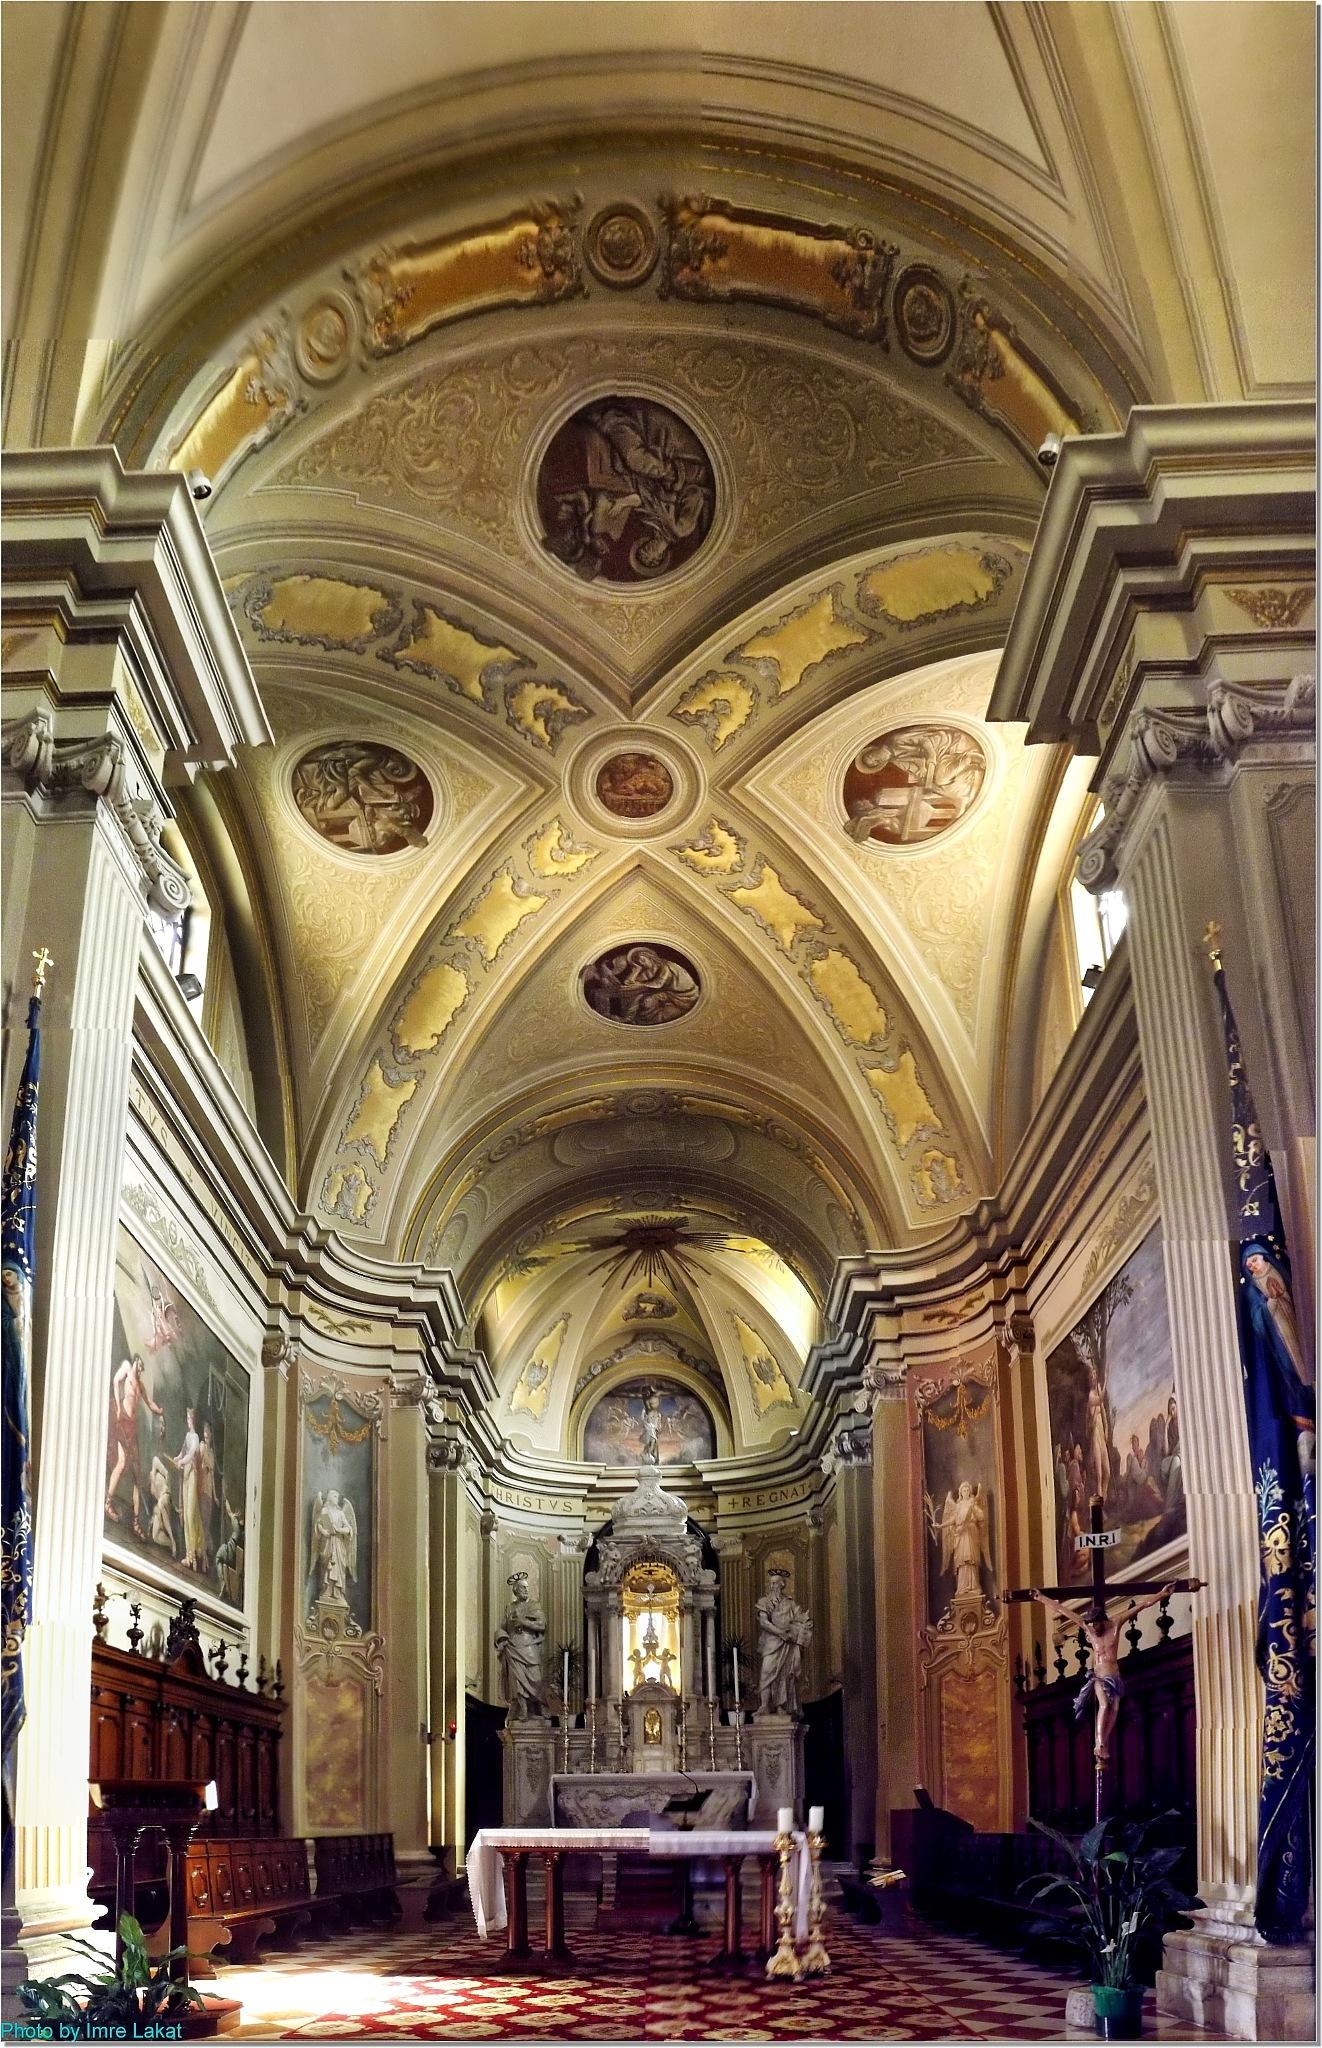 Duomo . Interior . Via Caterina Percoto, 19, Latisana UD, by Imre Lakat